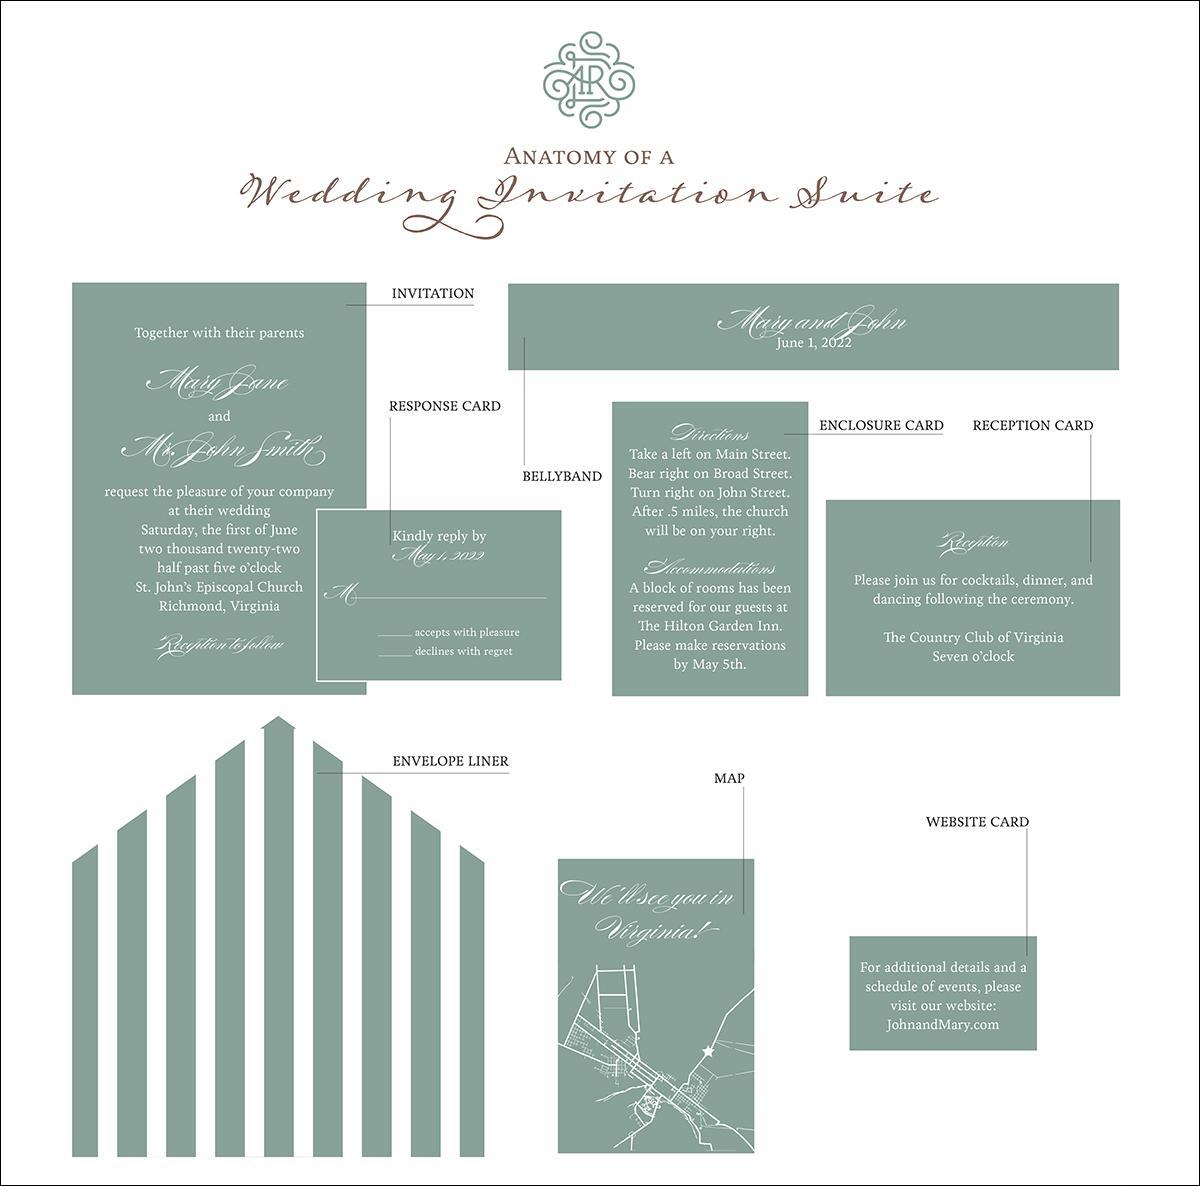 Anatomy of a Wedding Invitation Infographic